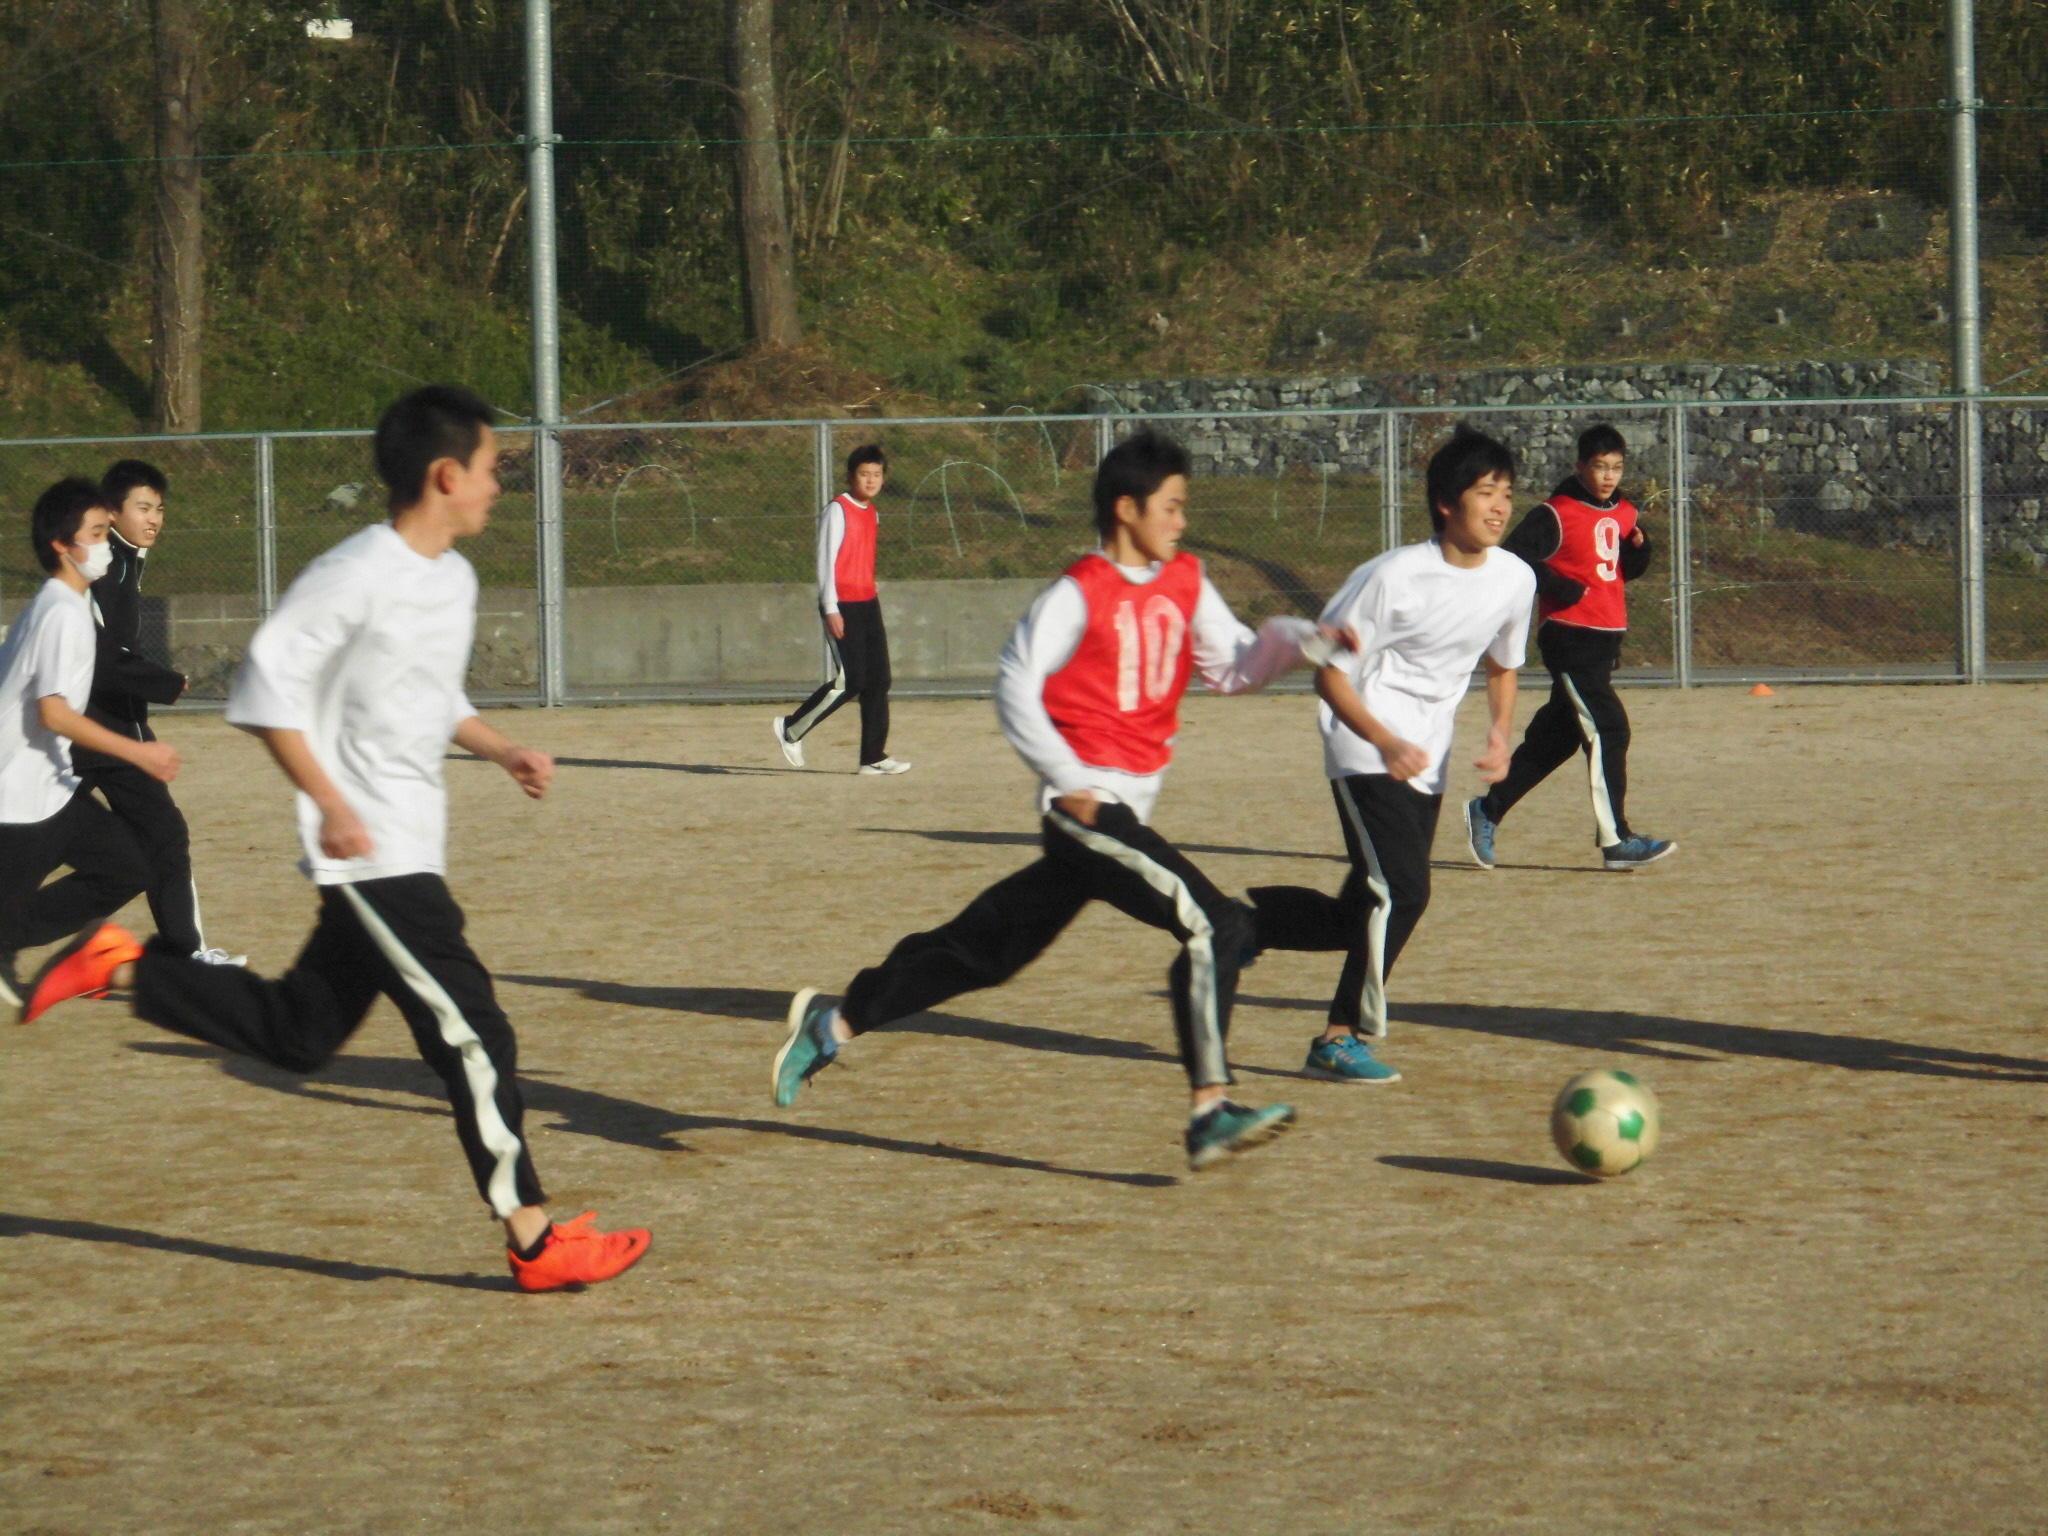 http://www.shimanet.ed.jp/hamadayougo/news/CIMG7789.JPG